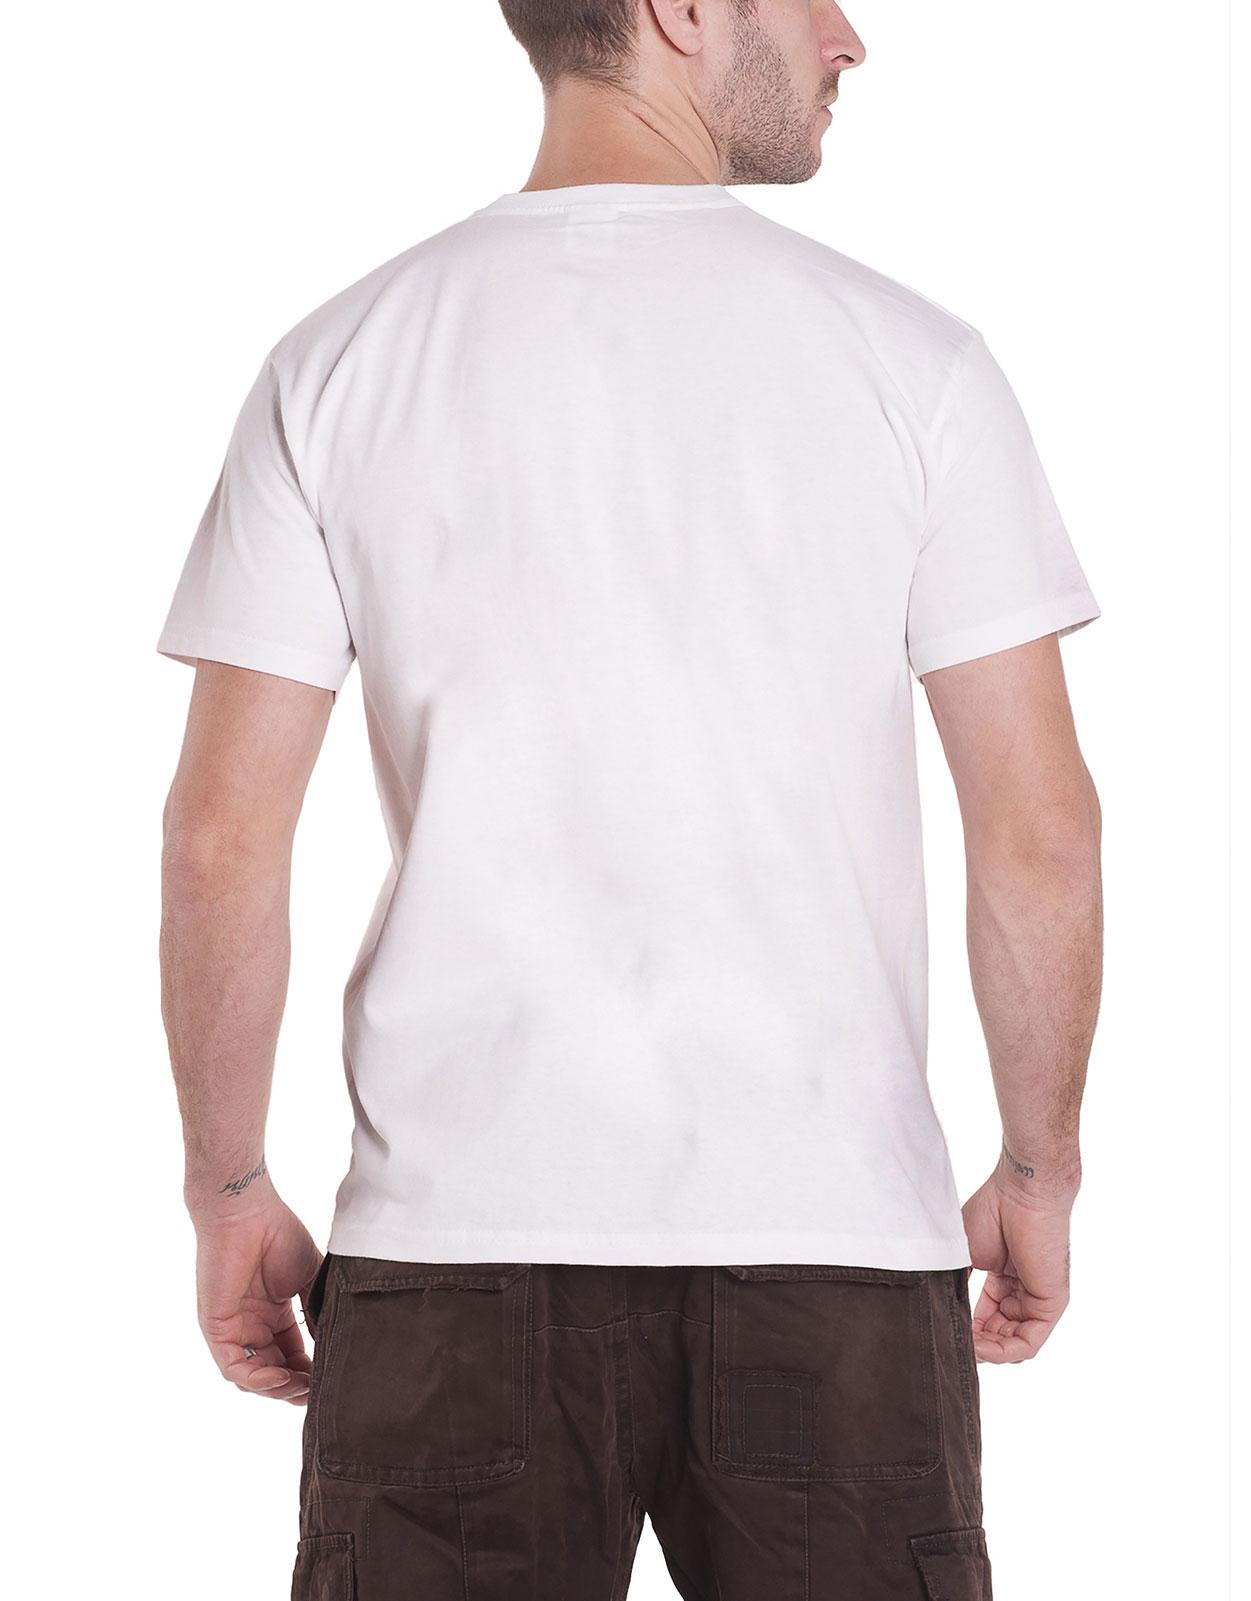 Camiseta-Last-Jedi-De-Star-Wars-Movie-Poster-porgs-Guardia-pretoriana-oficial-para-hombre miniatura 3